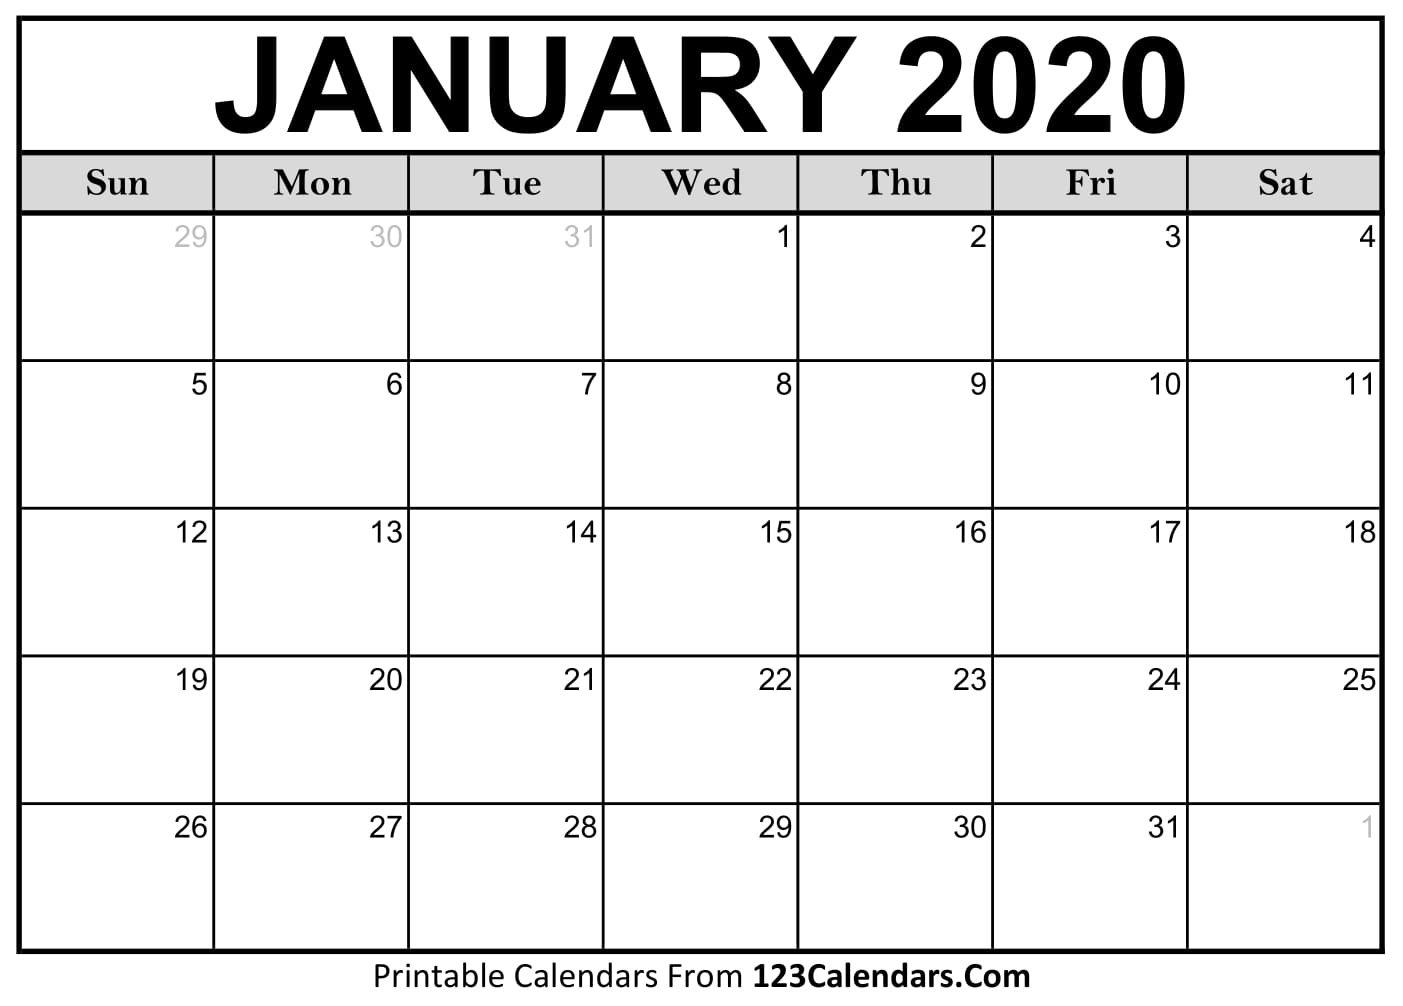 Printable Fill In Calendar For 2020 – Calendar Inspiration Free Printable Fill In Calendars